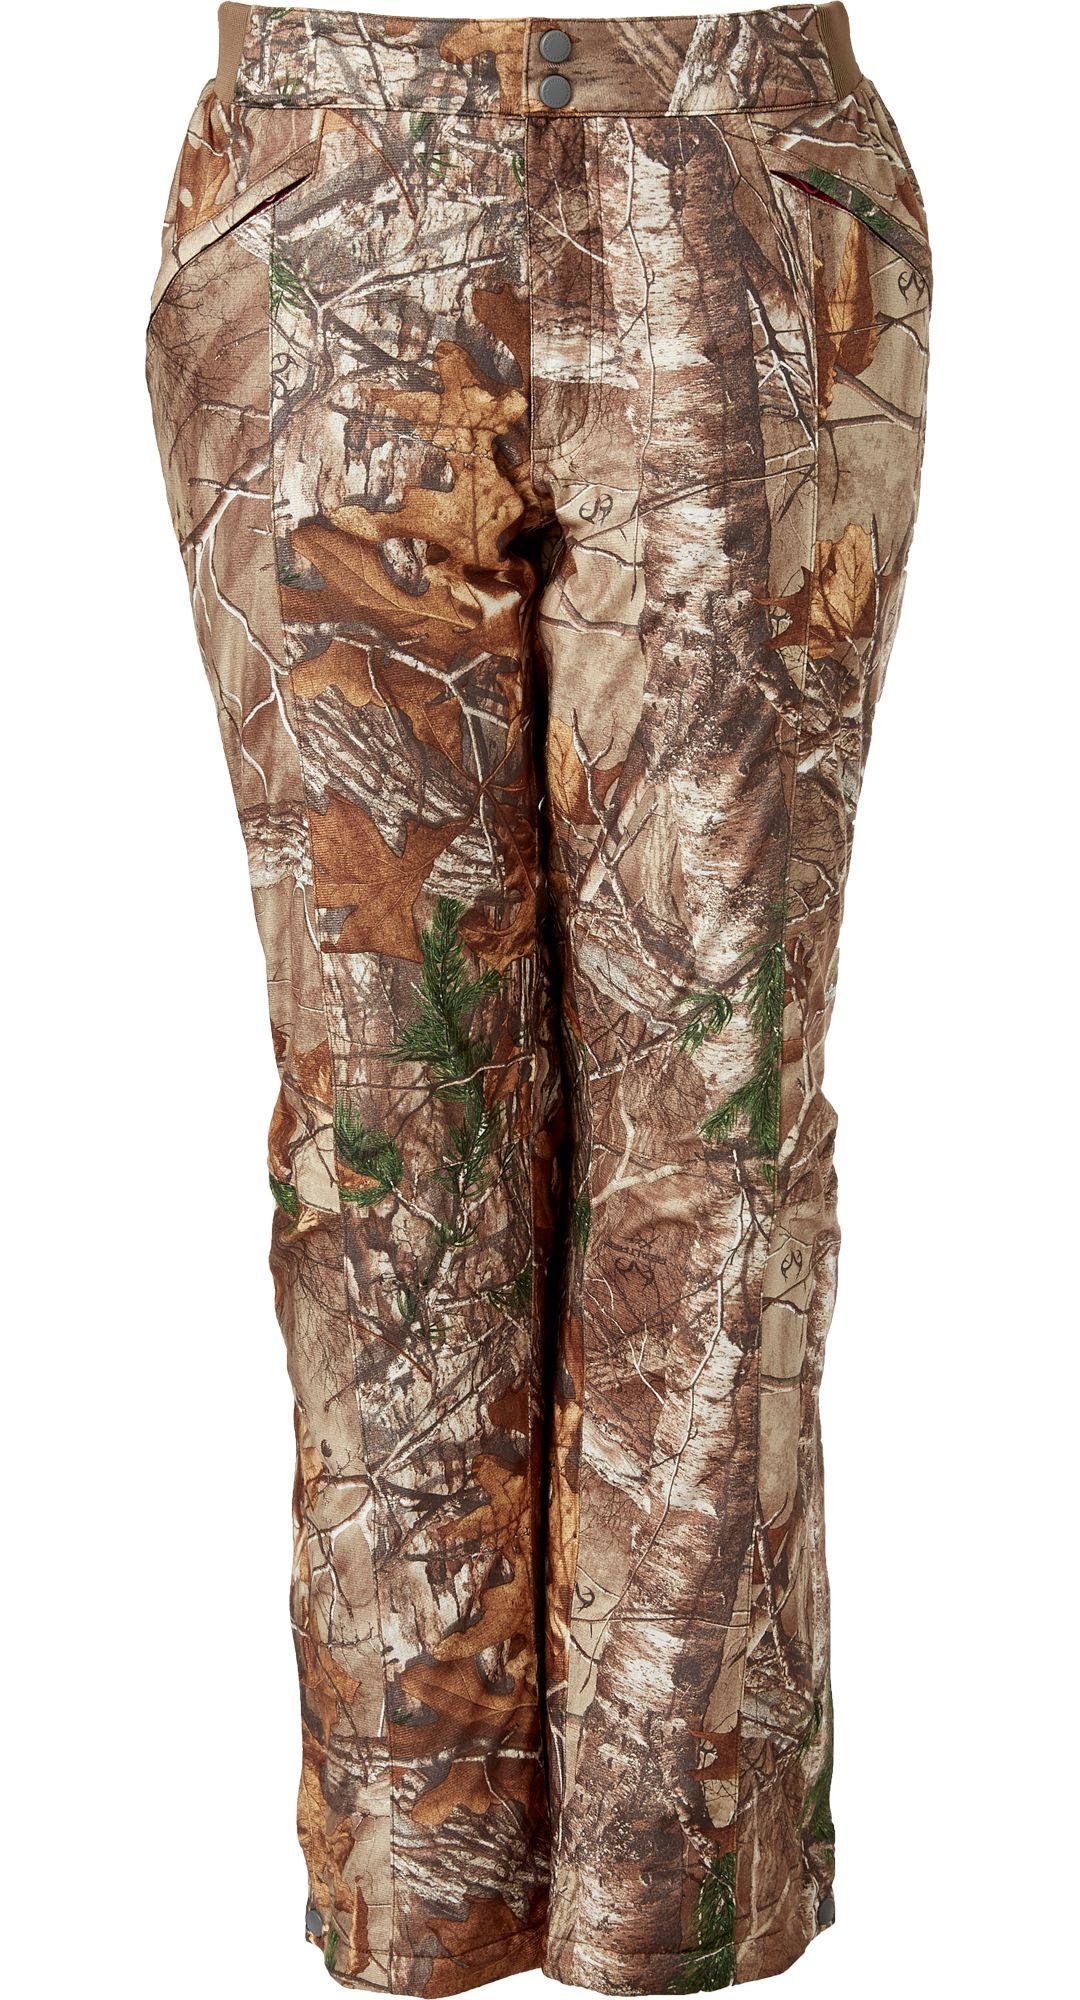 6821486f Field & Stream Women's True Pursuit Insulated Hunting Pants   Field ...